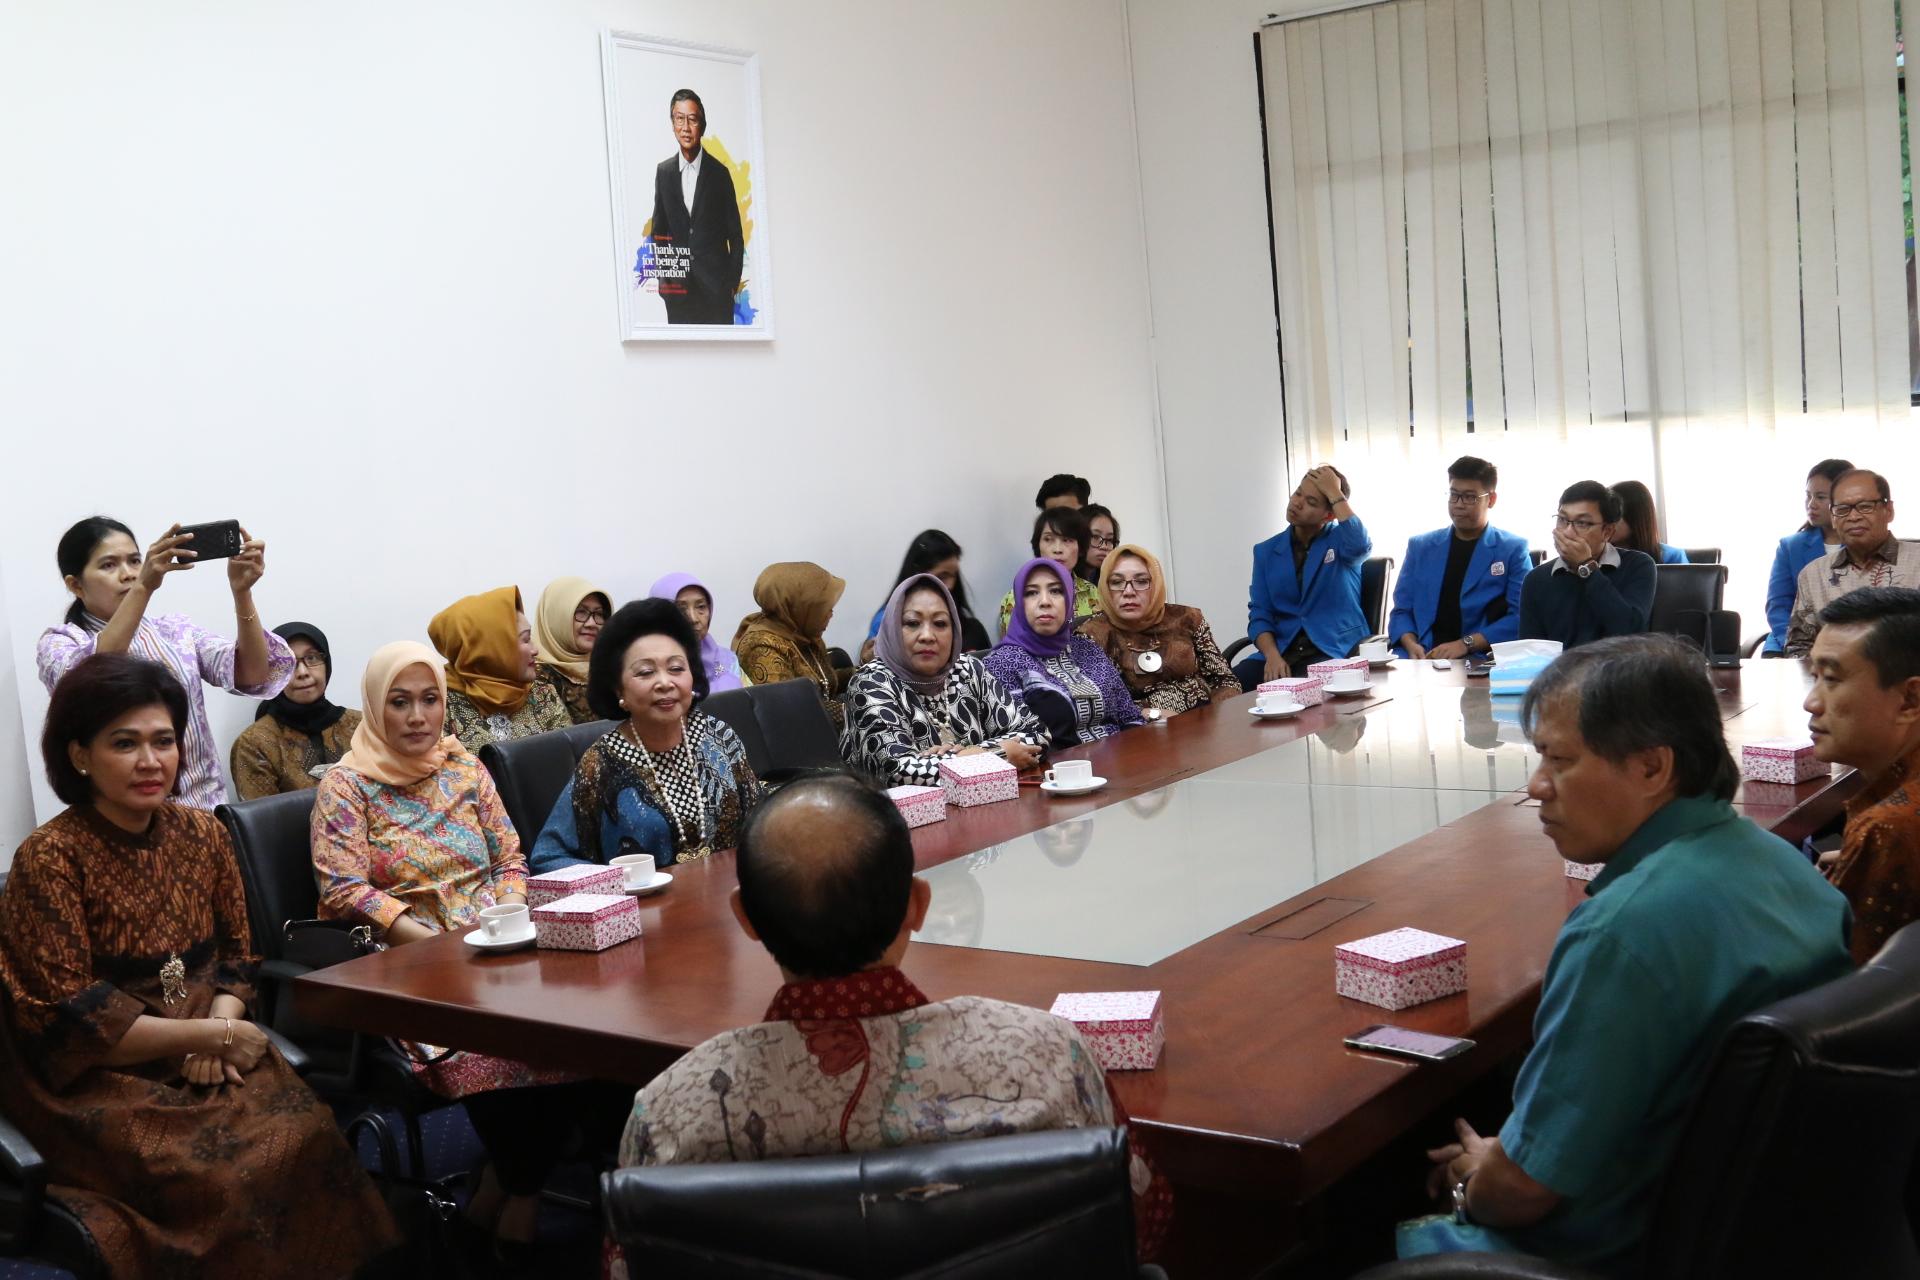 Prof. Budi Susilo Soepandji welcomed Mrs. Nora Tristyana and team